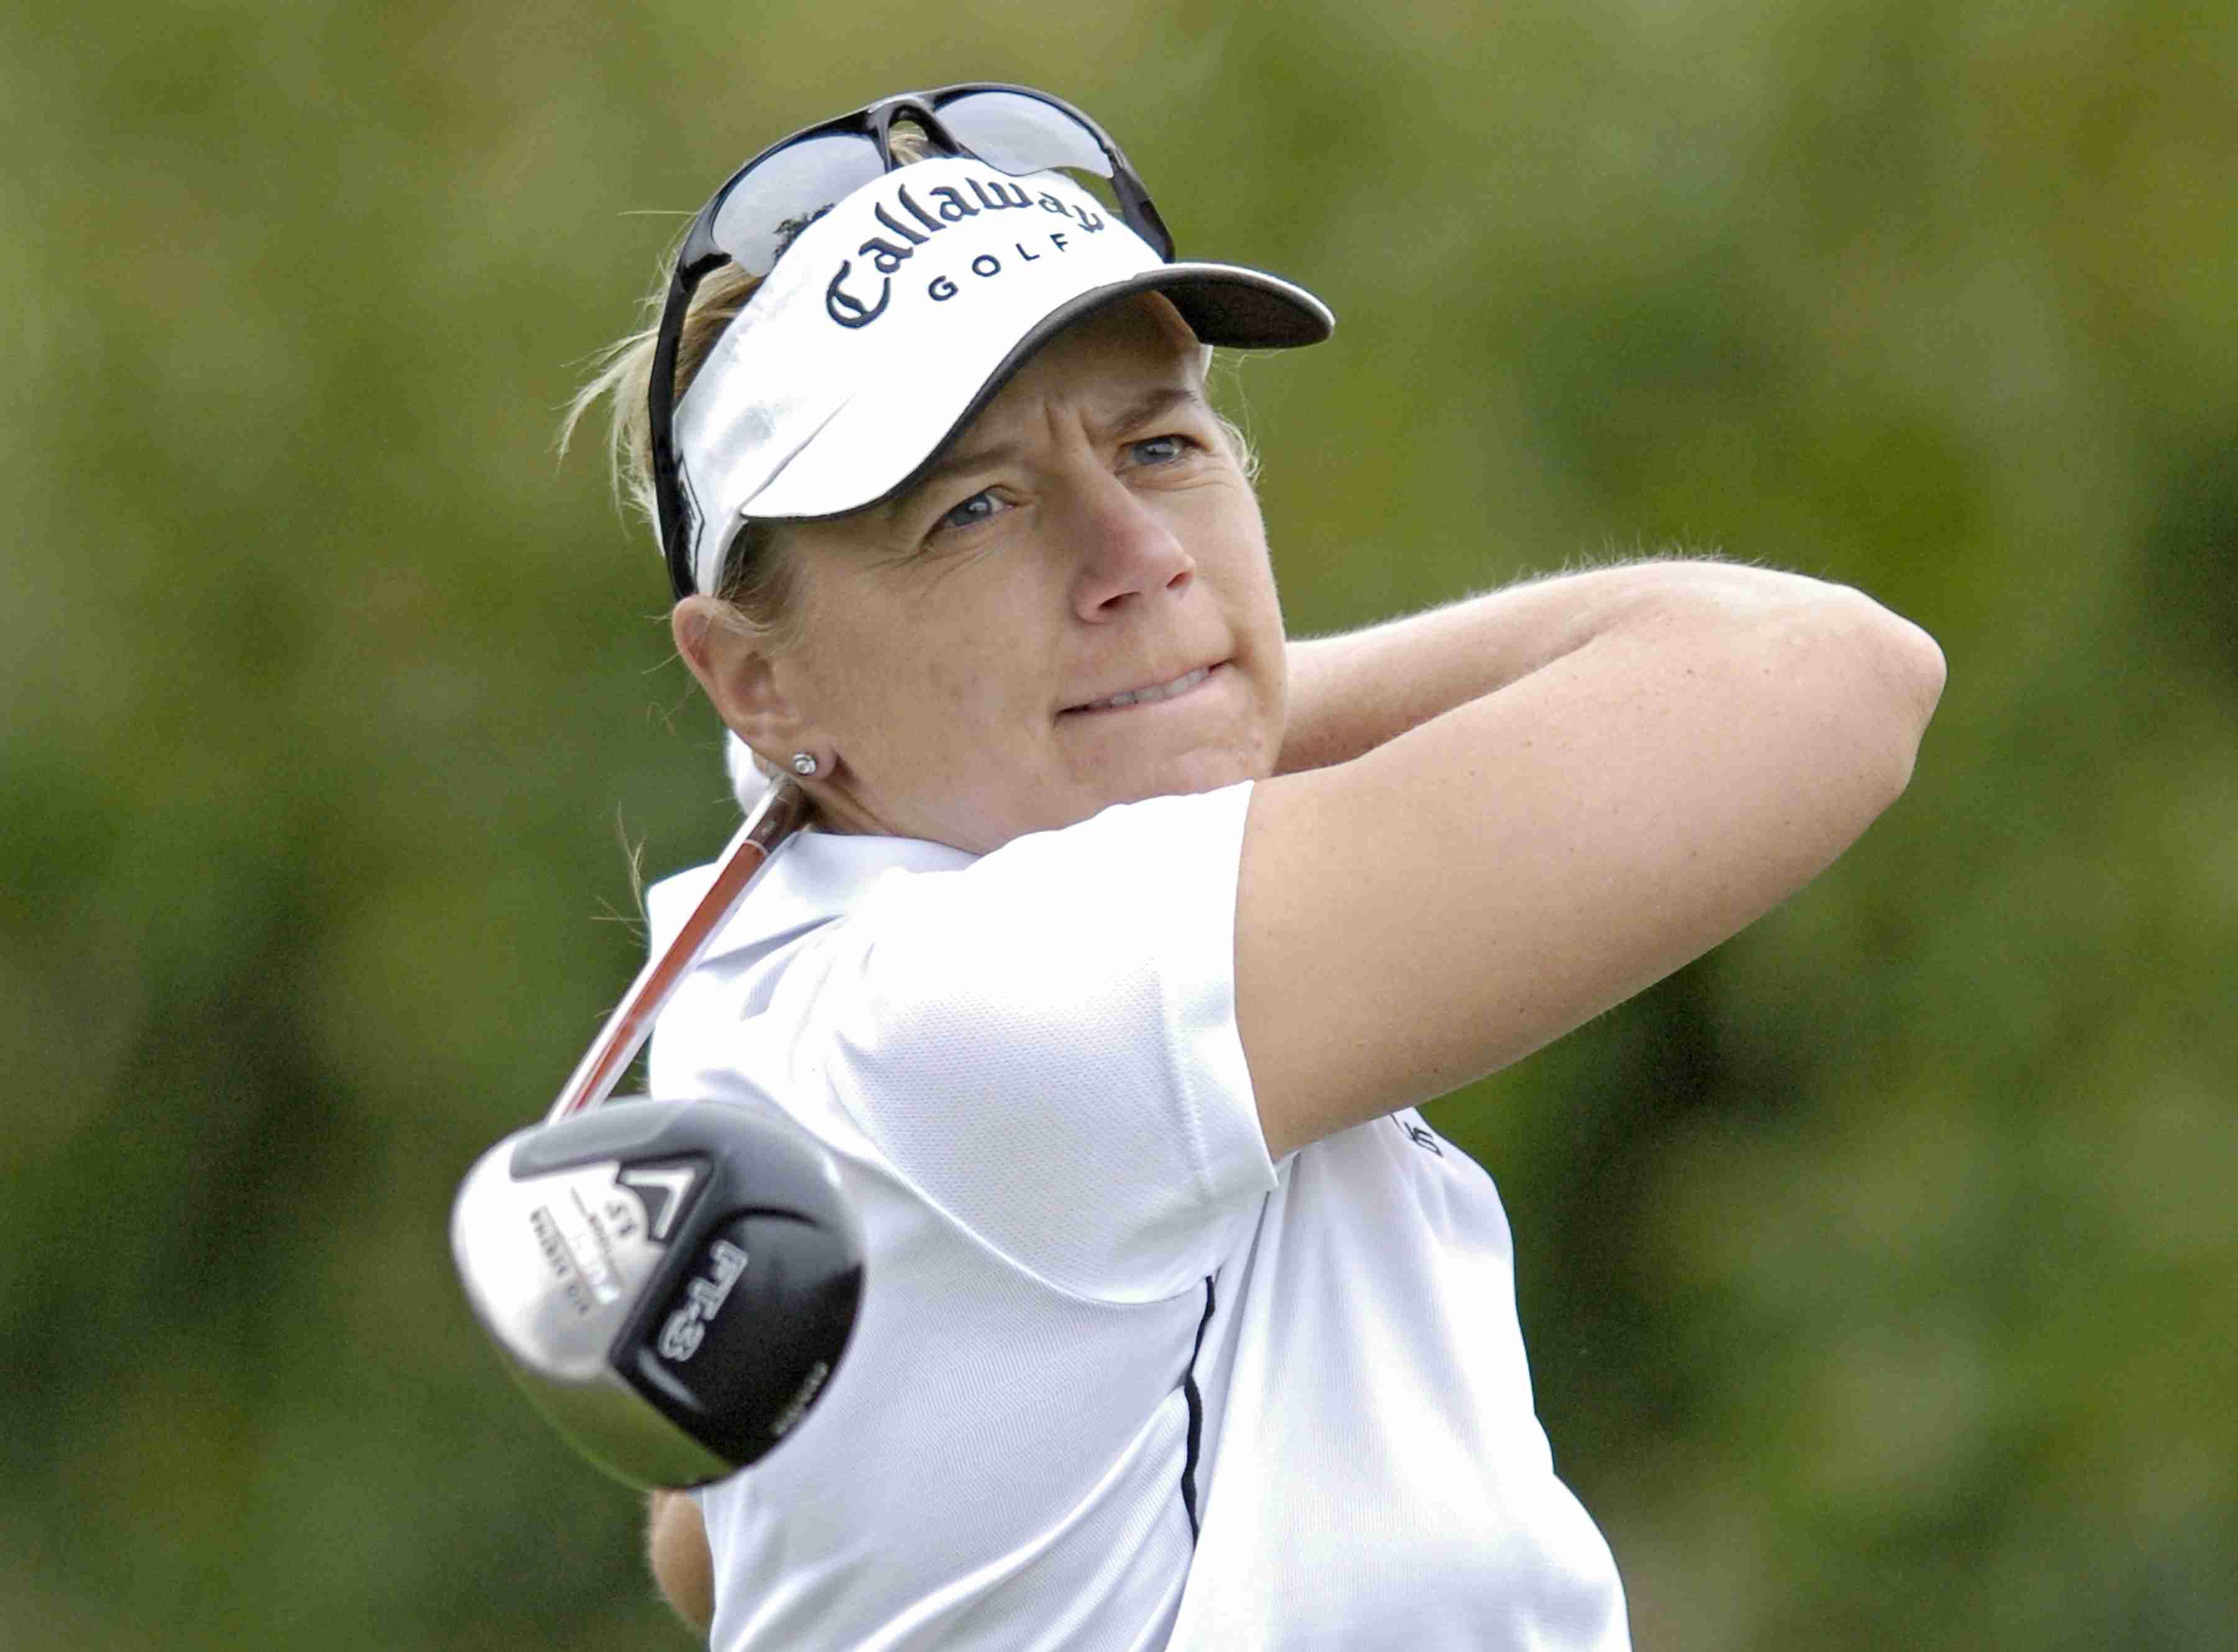 Annika Sorenstam is the greatest female golfer of all-time